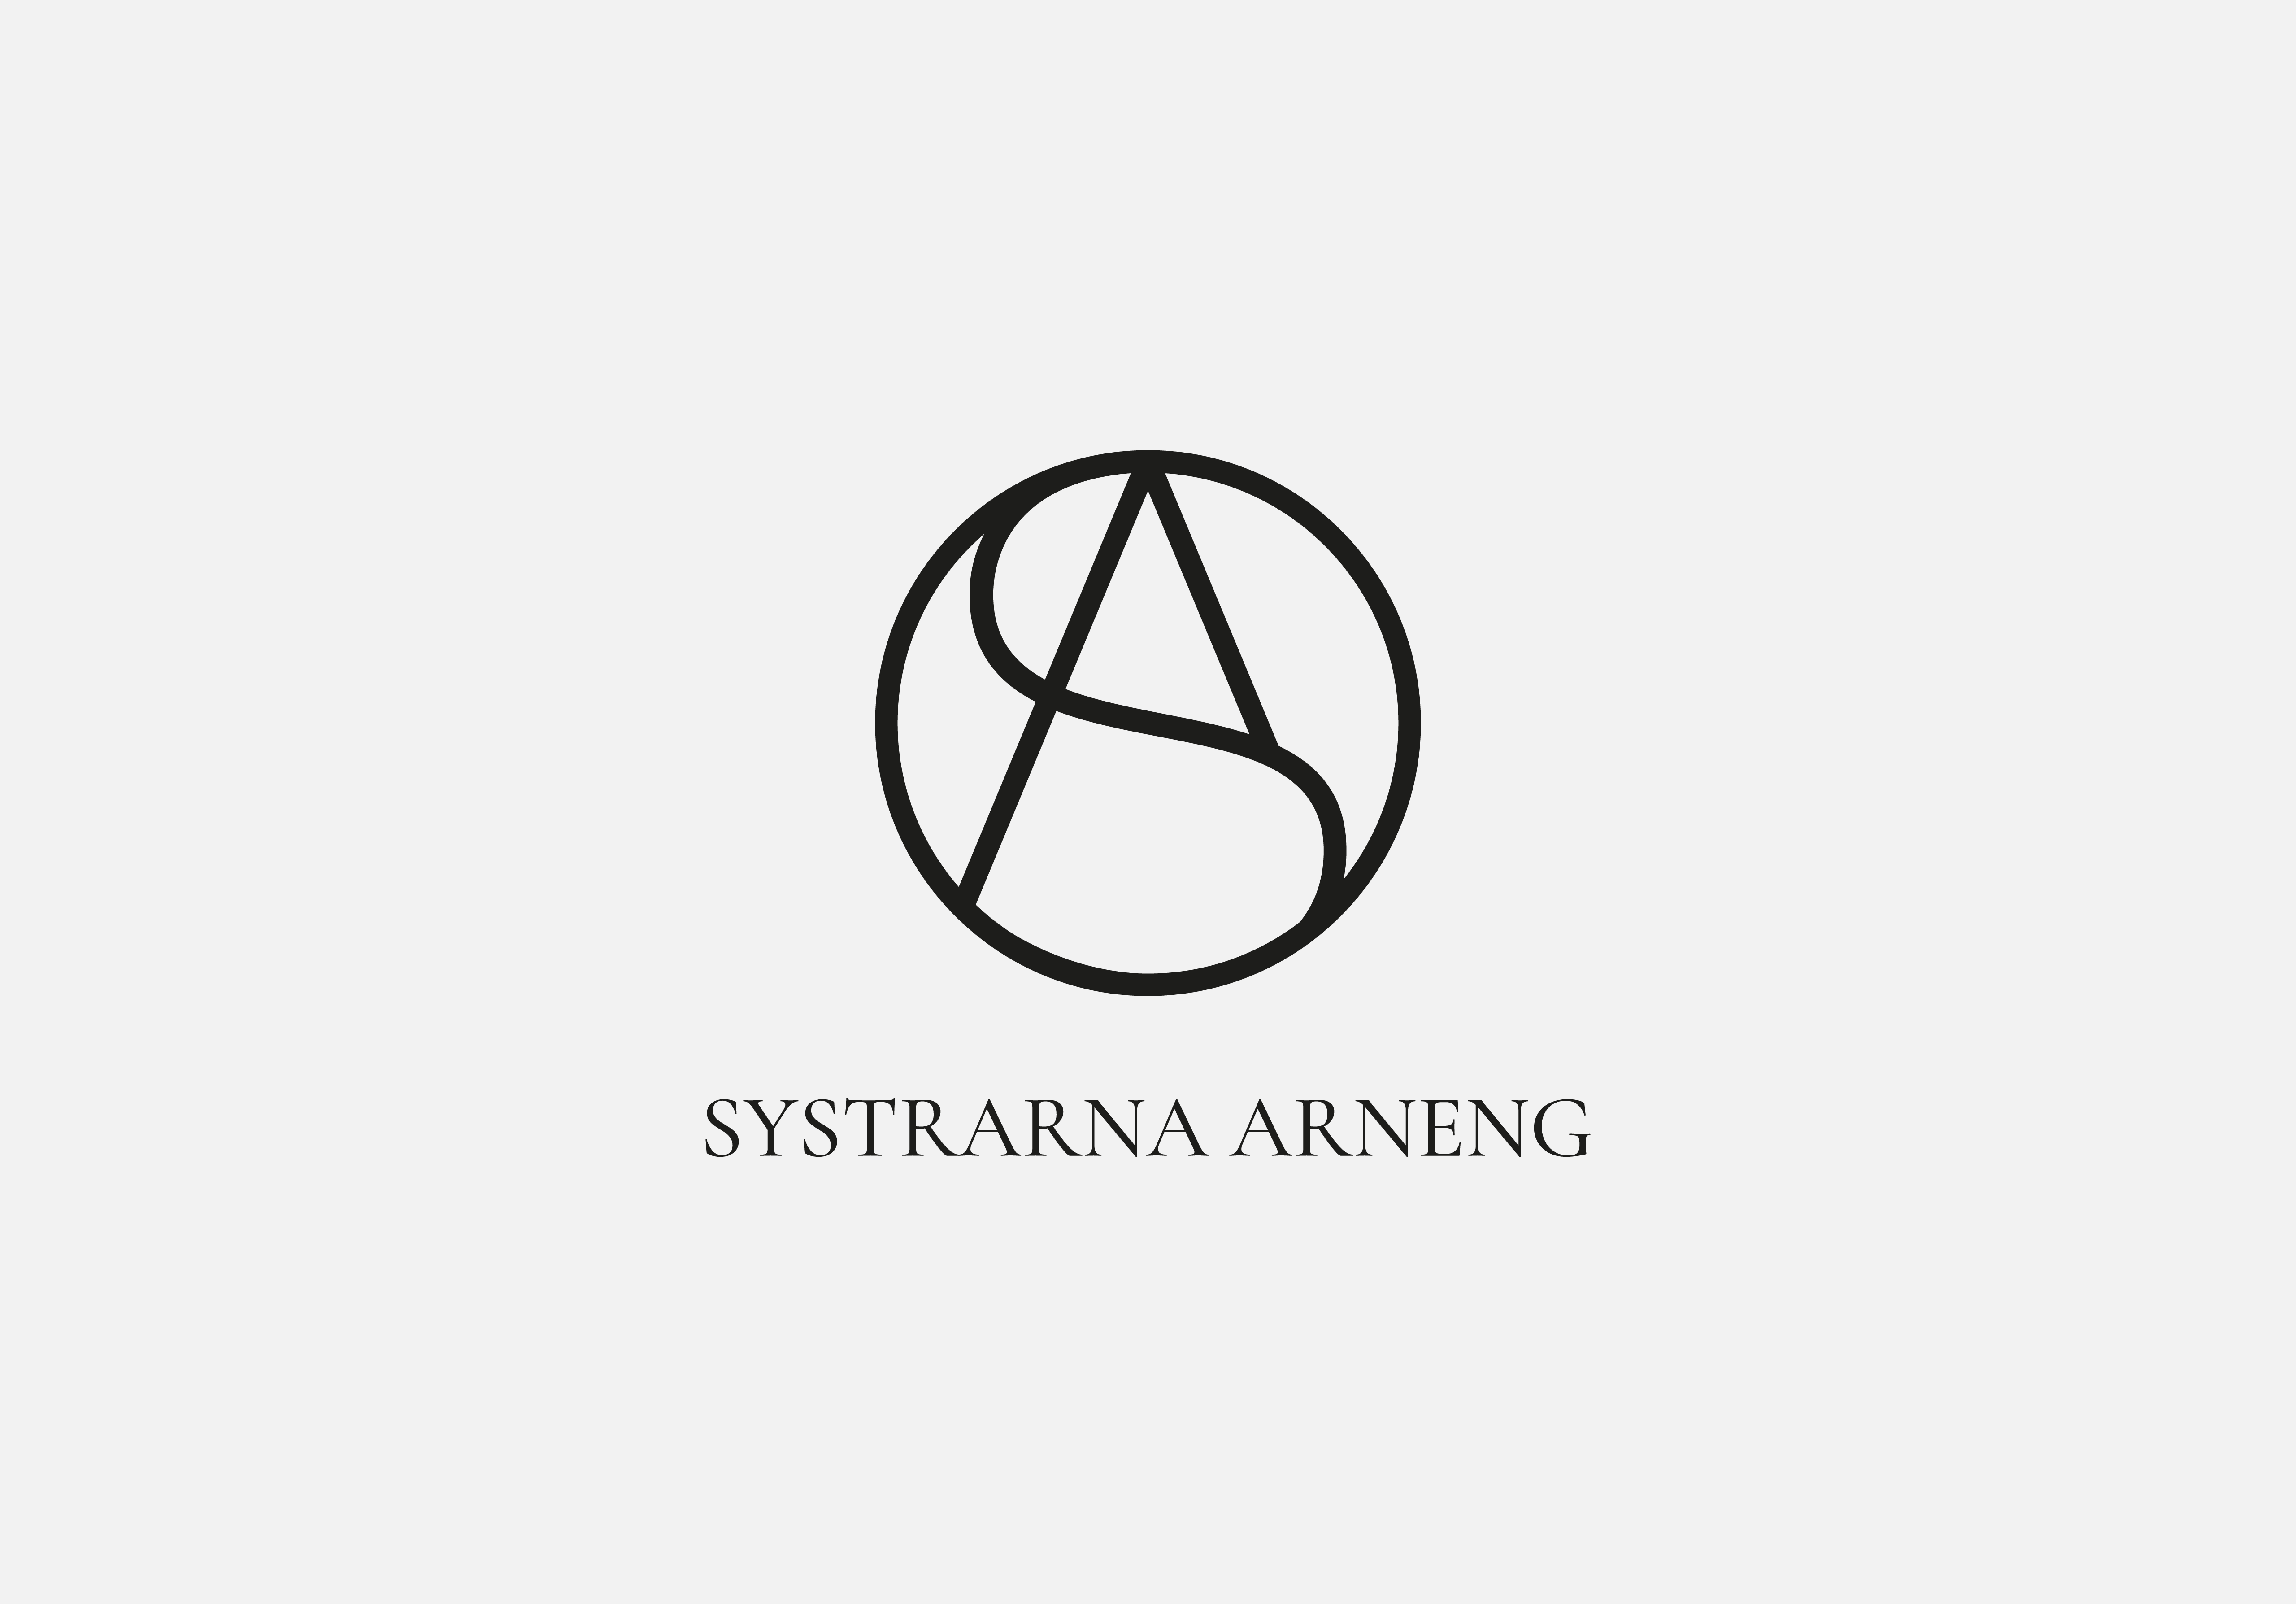 arneng-profil1